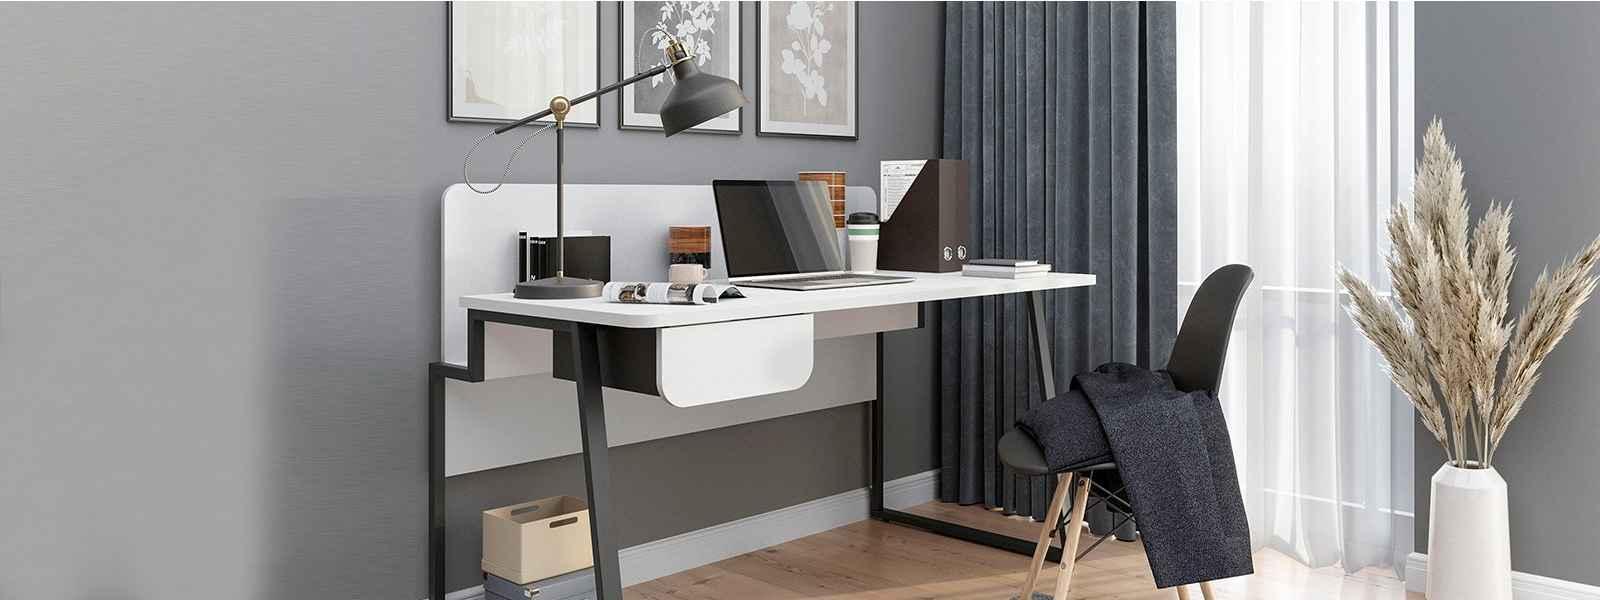 Arbeitszimmer & Büromöbel